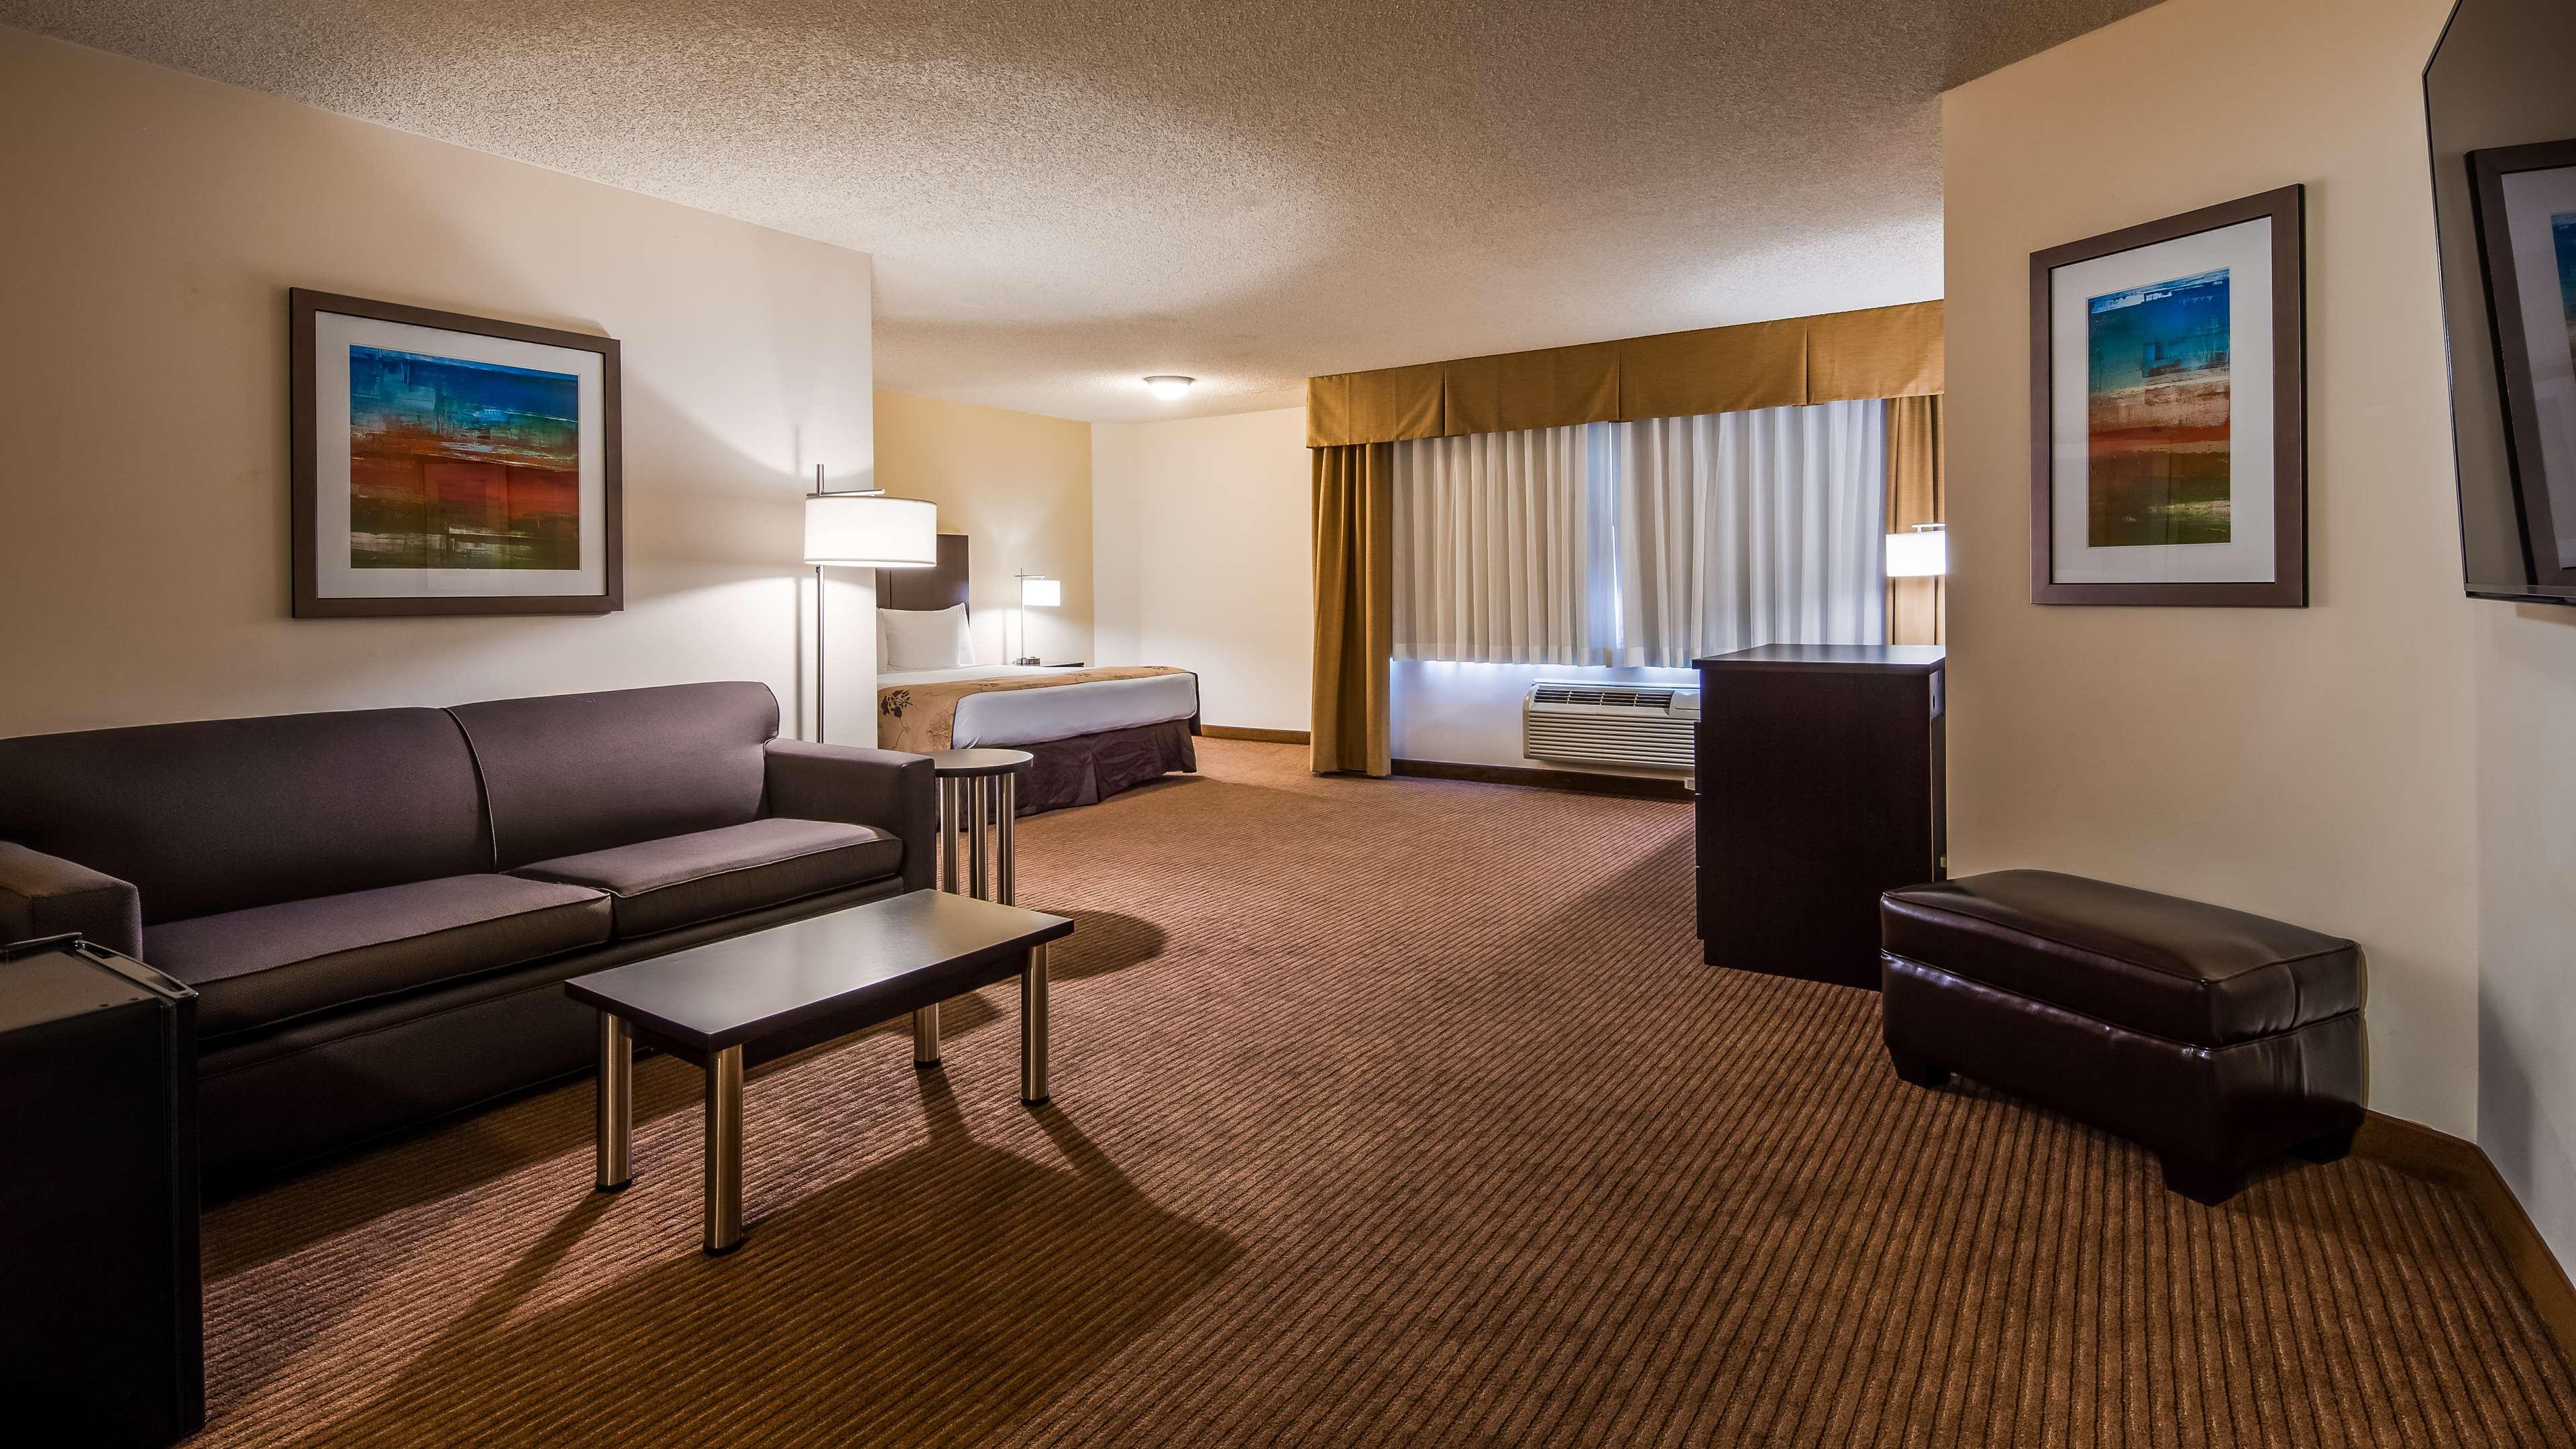 Suite Best Western Seattle Airport Hotel Seattle (206)878-3300